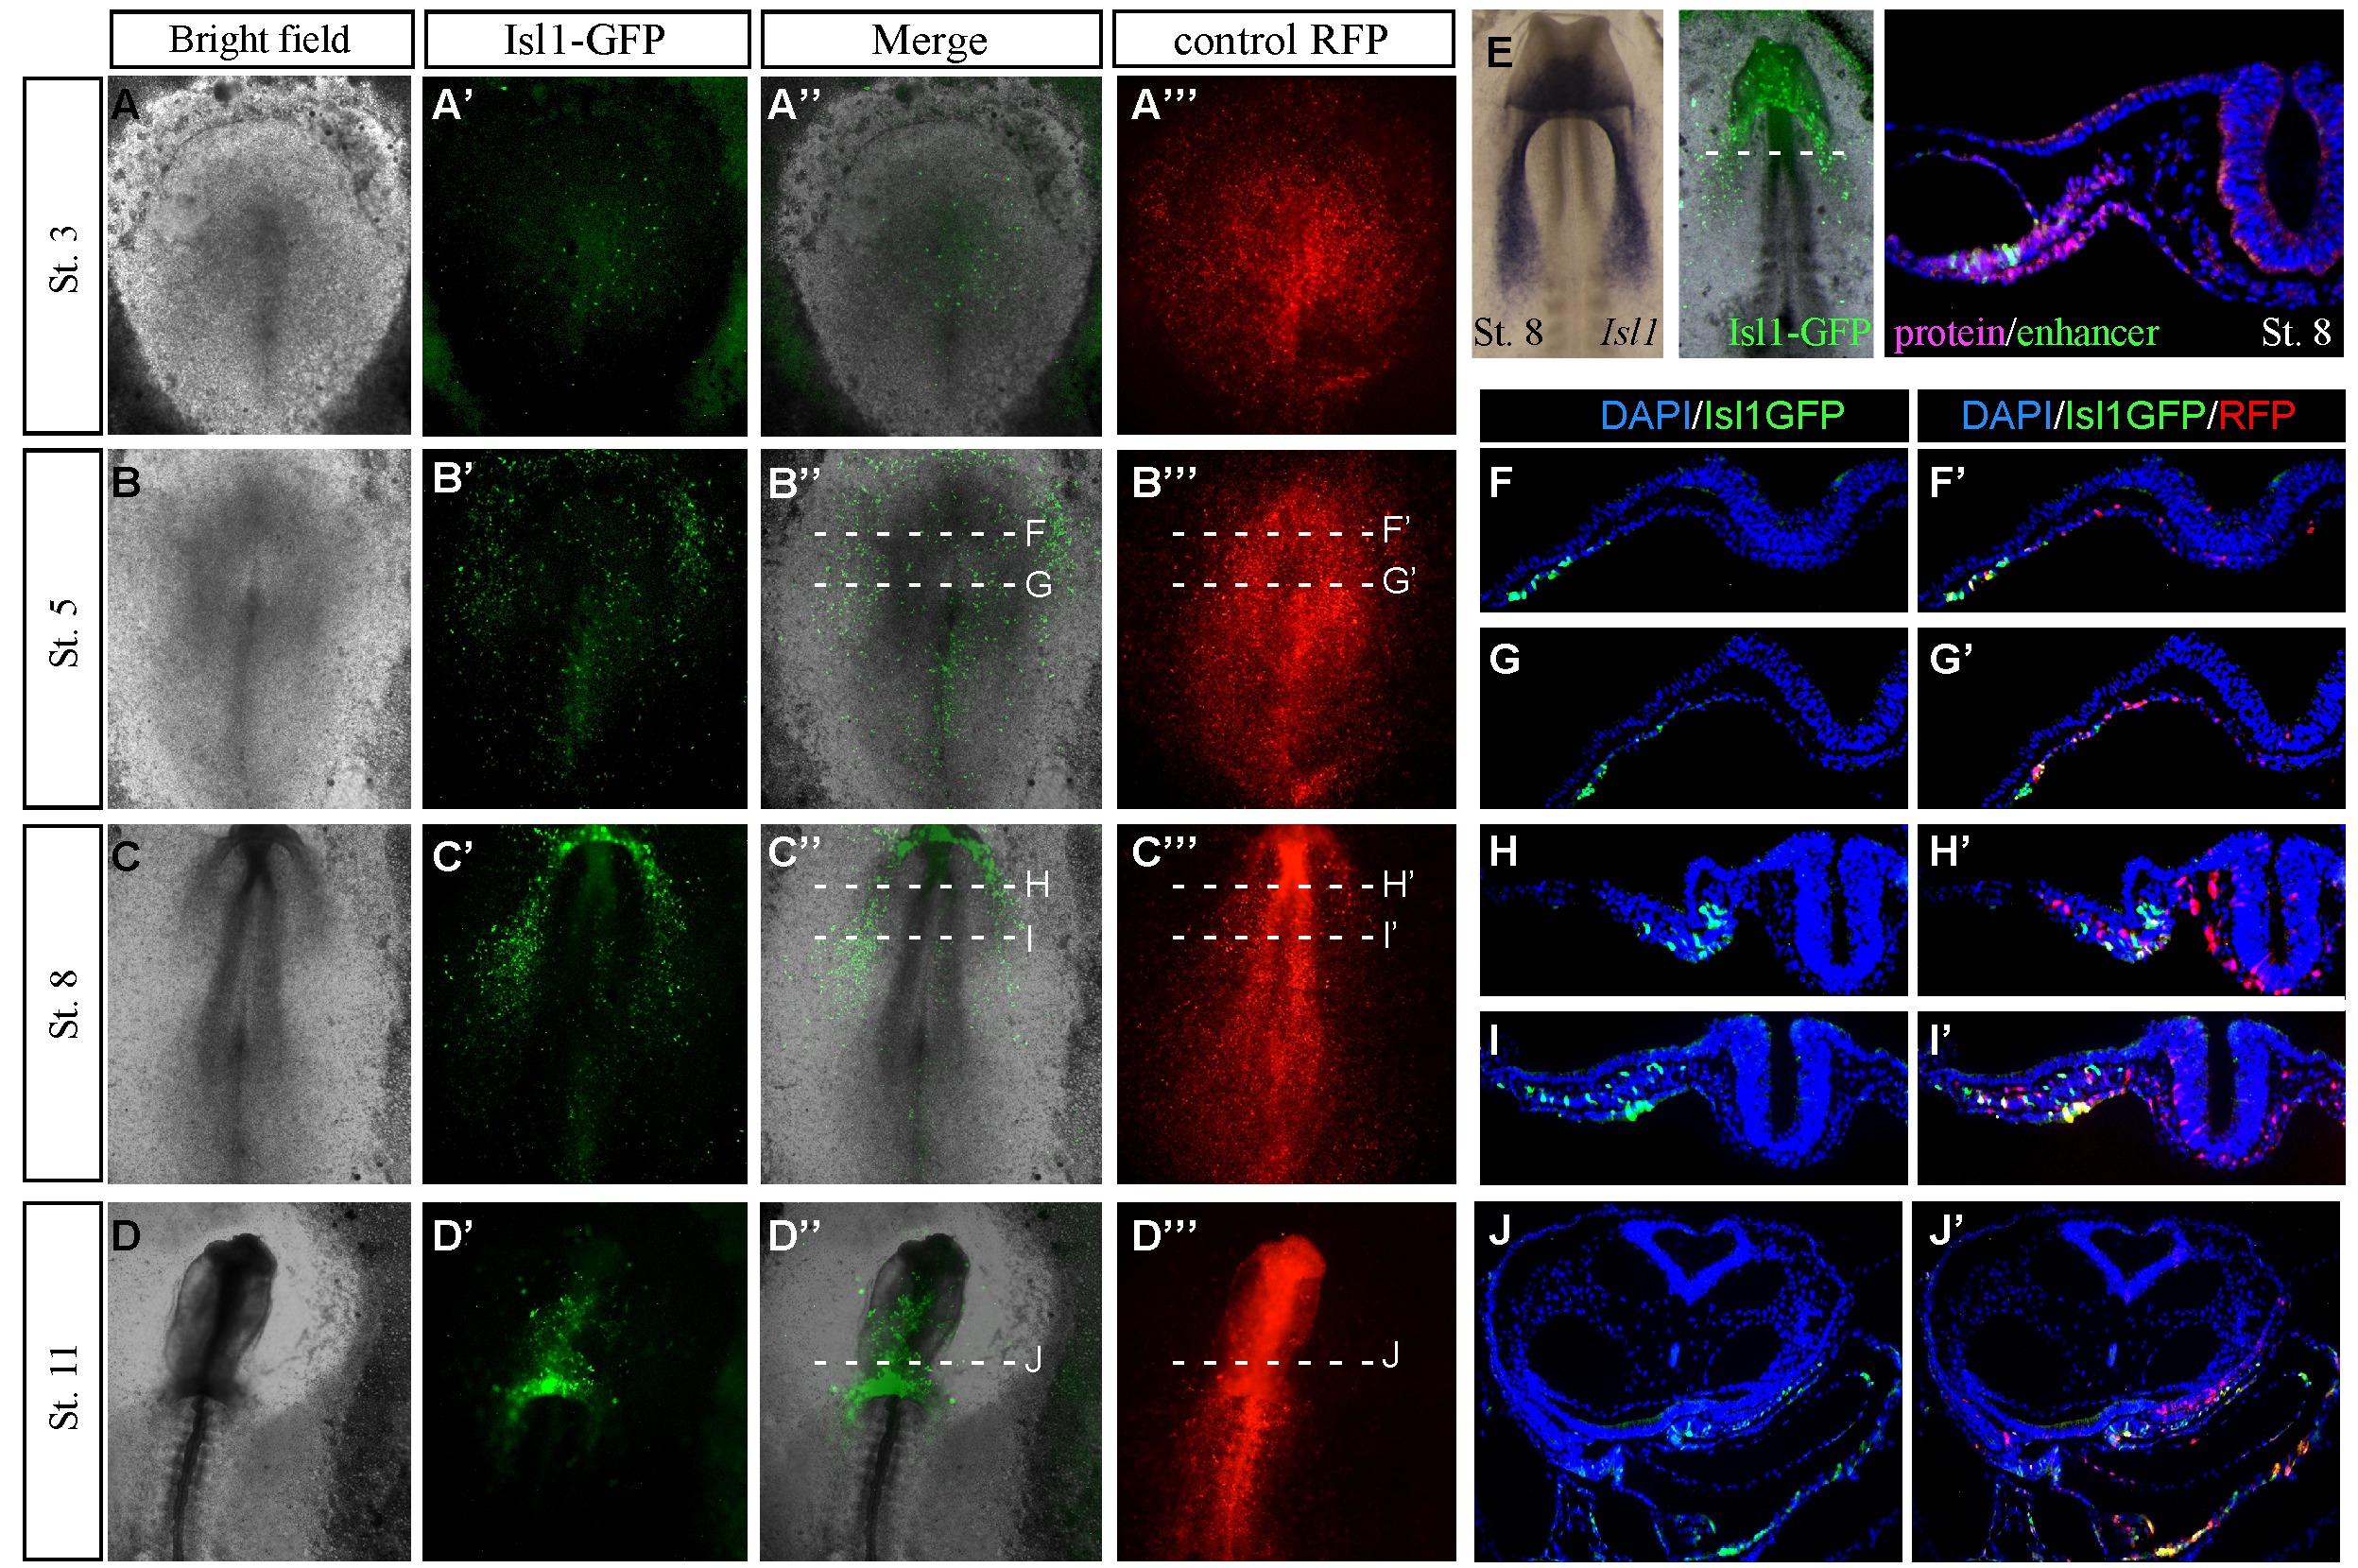 Nkx2 5 marks angioblasts that contribute to hemogenic